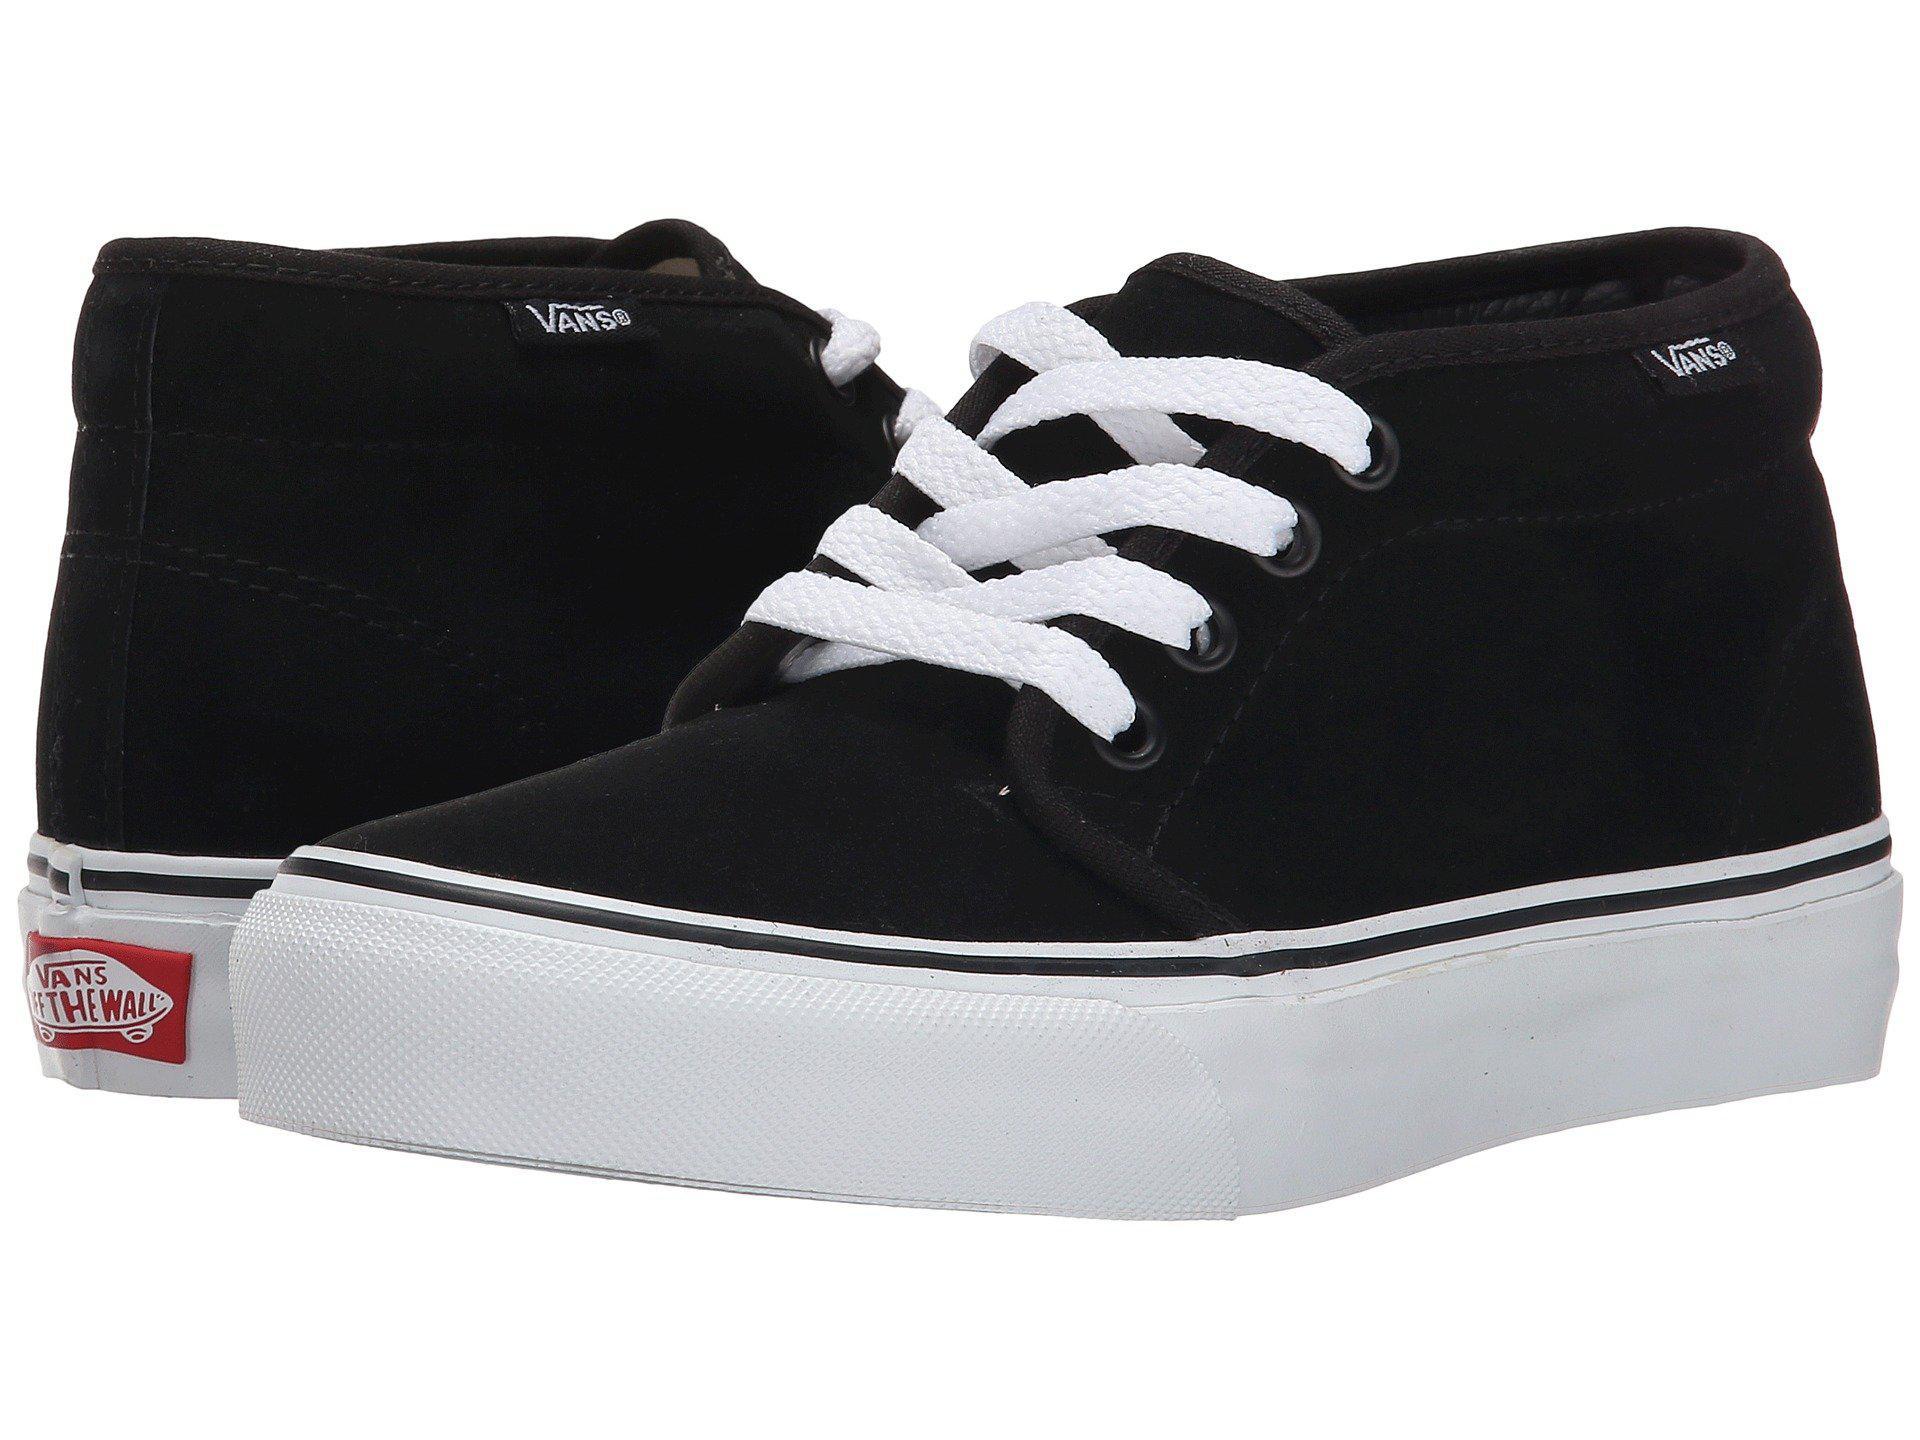 143c3b49ee2af1 Lyst - Vans Chukka Boot Core Classics in Black for Men